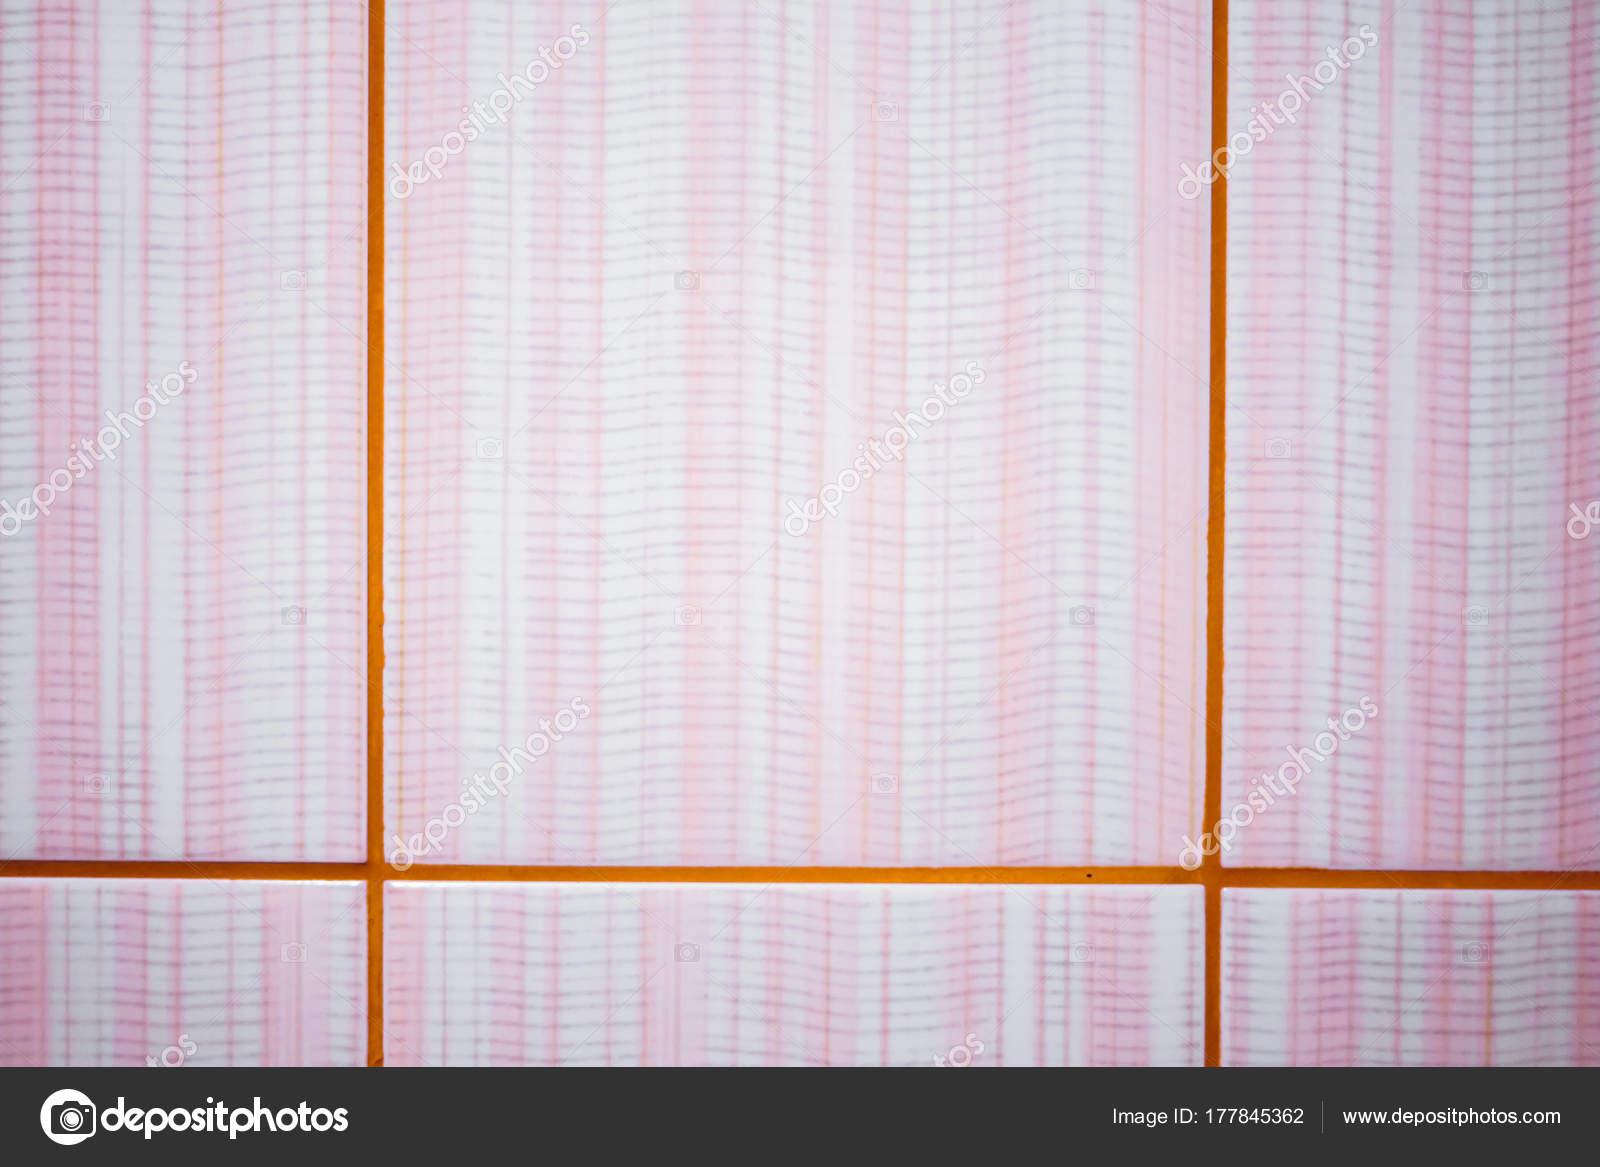 La texture della piastrella u2014 foto stock © venerala #177845362